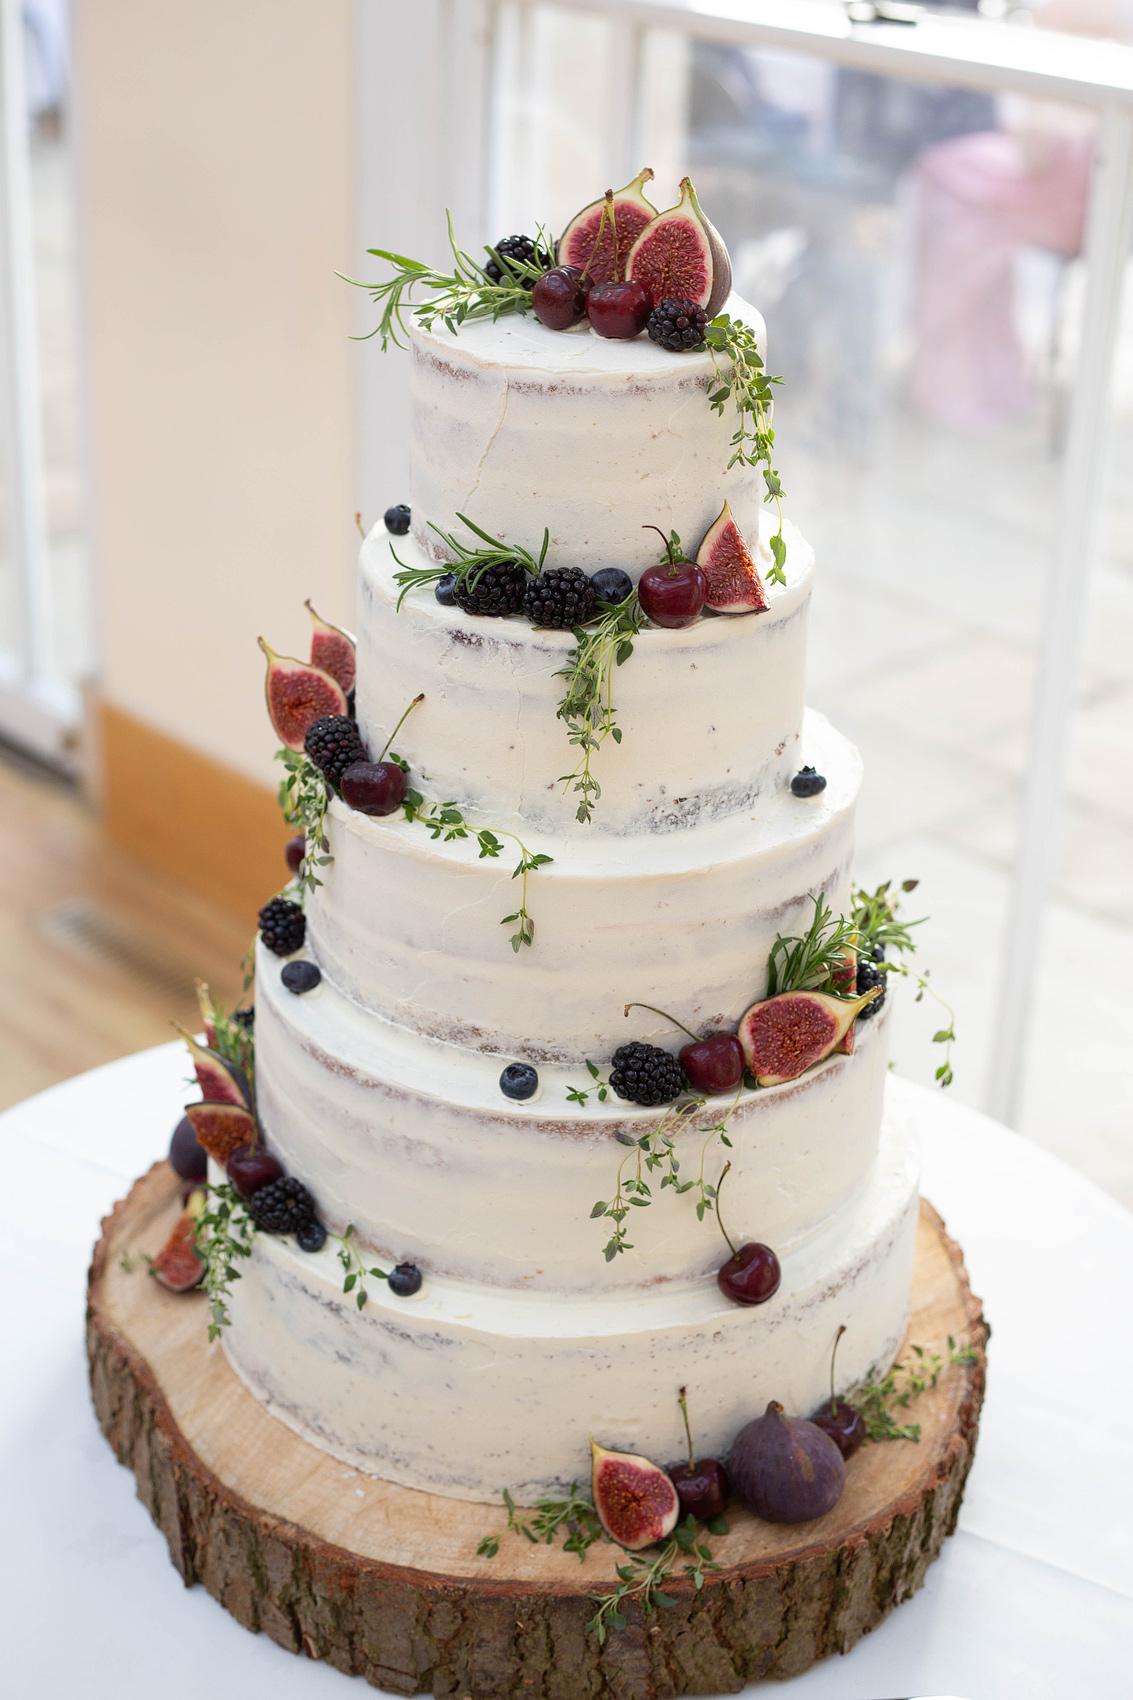 Claire_Basiuk_Richmond_Park,_London_Wedding_Photography_-18.jpg